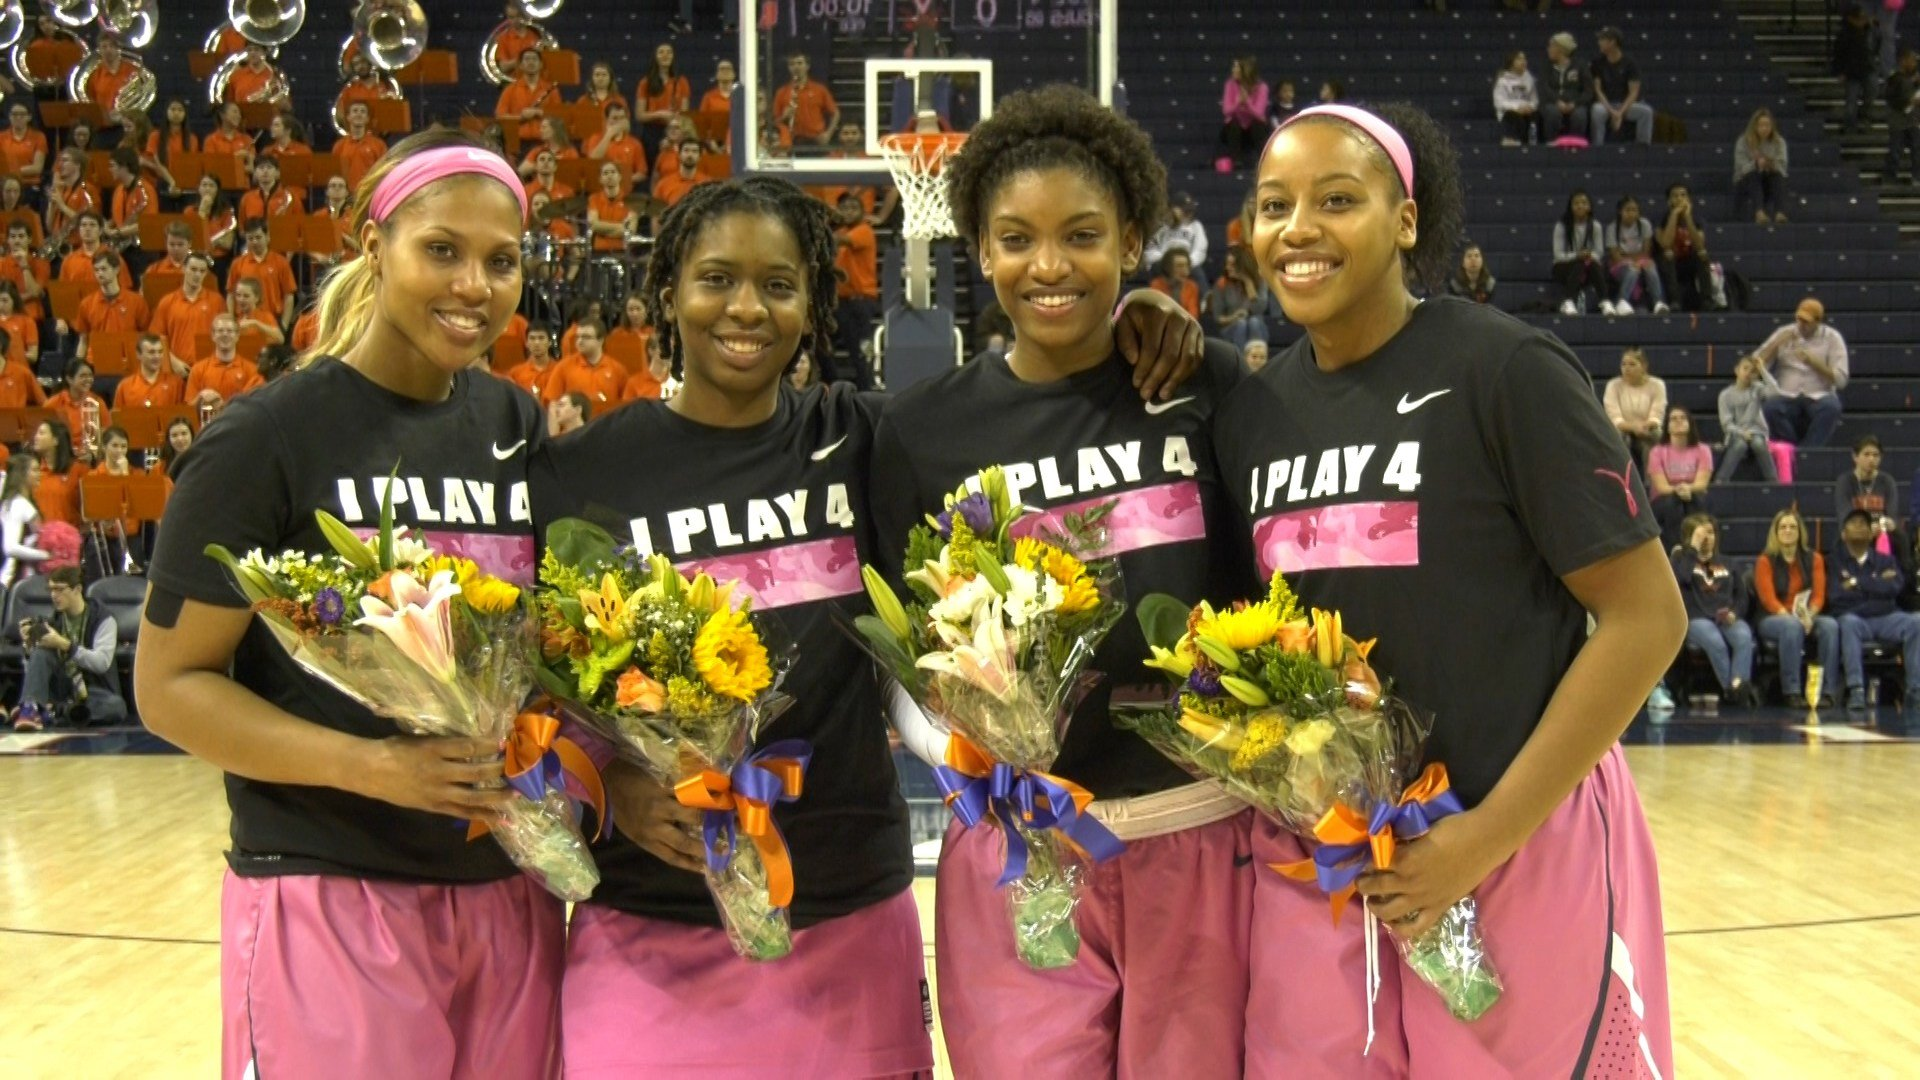 UVA Seniors Jae'Lisa Allen, J'Kyra Brown, Aliyah Huland El and Lauren Moses were honored on Senior Day